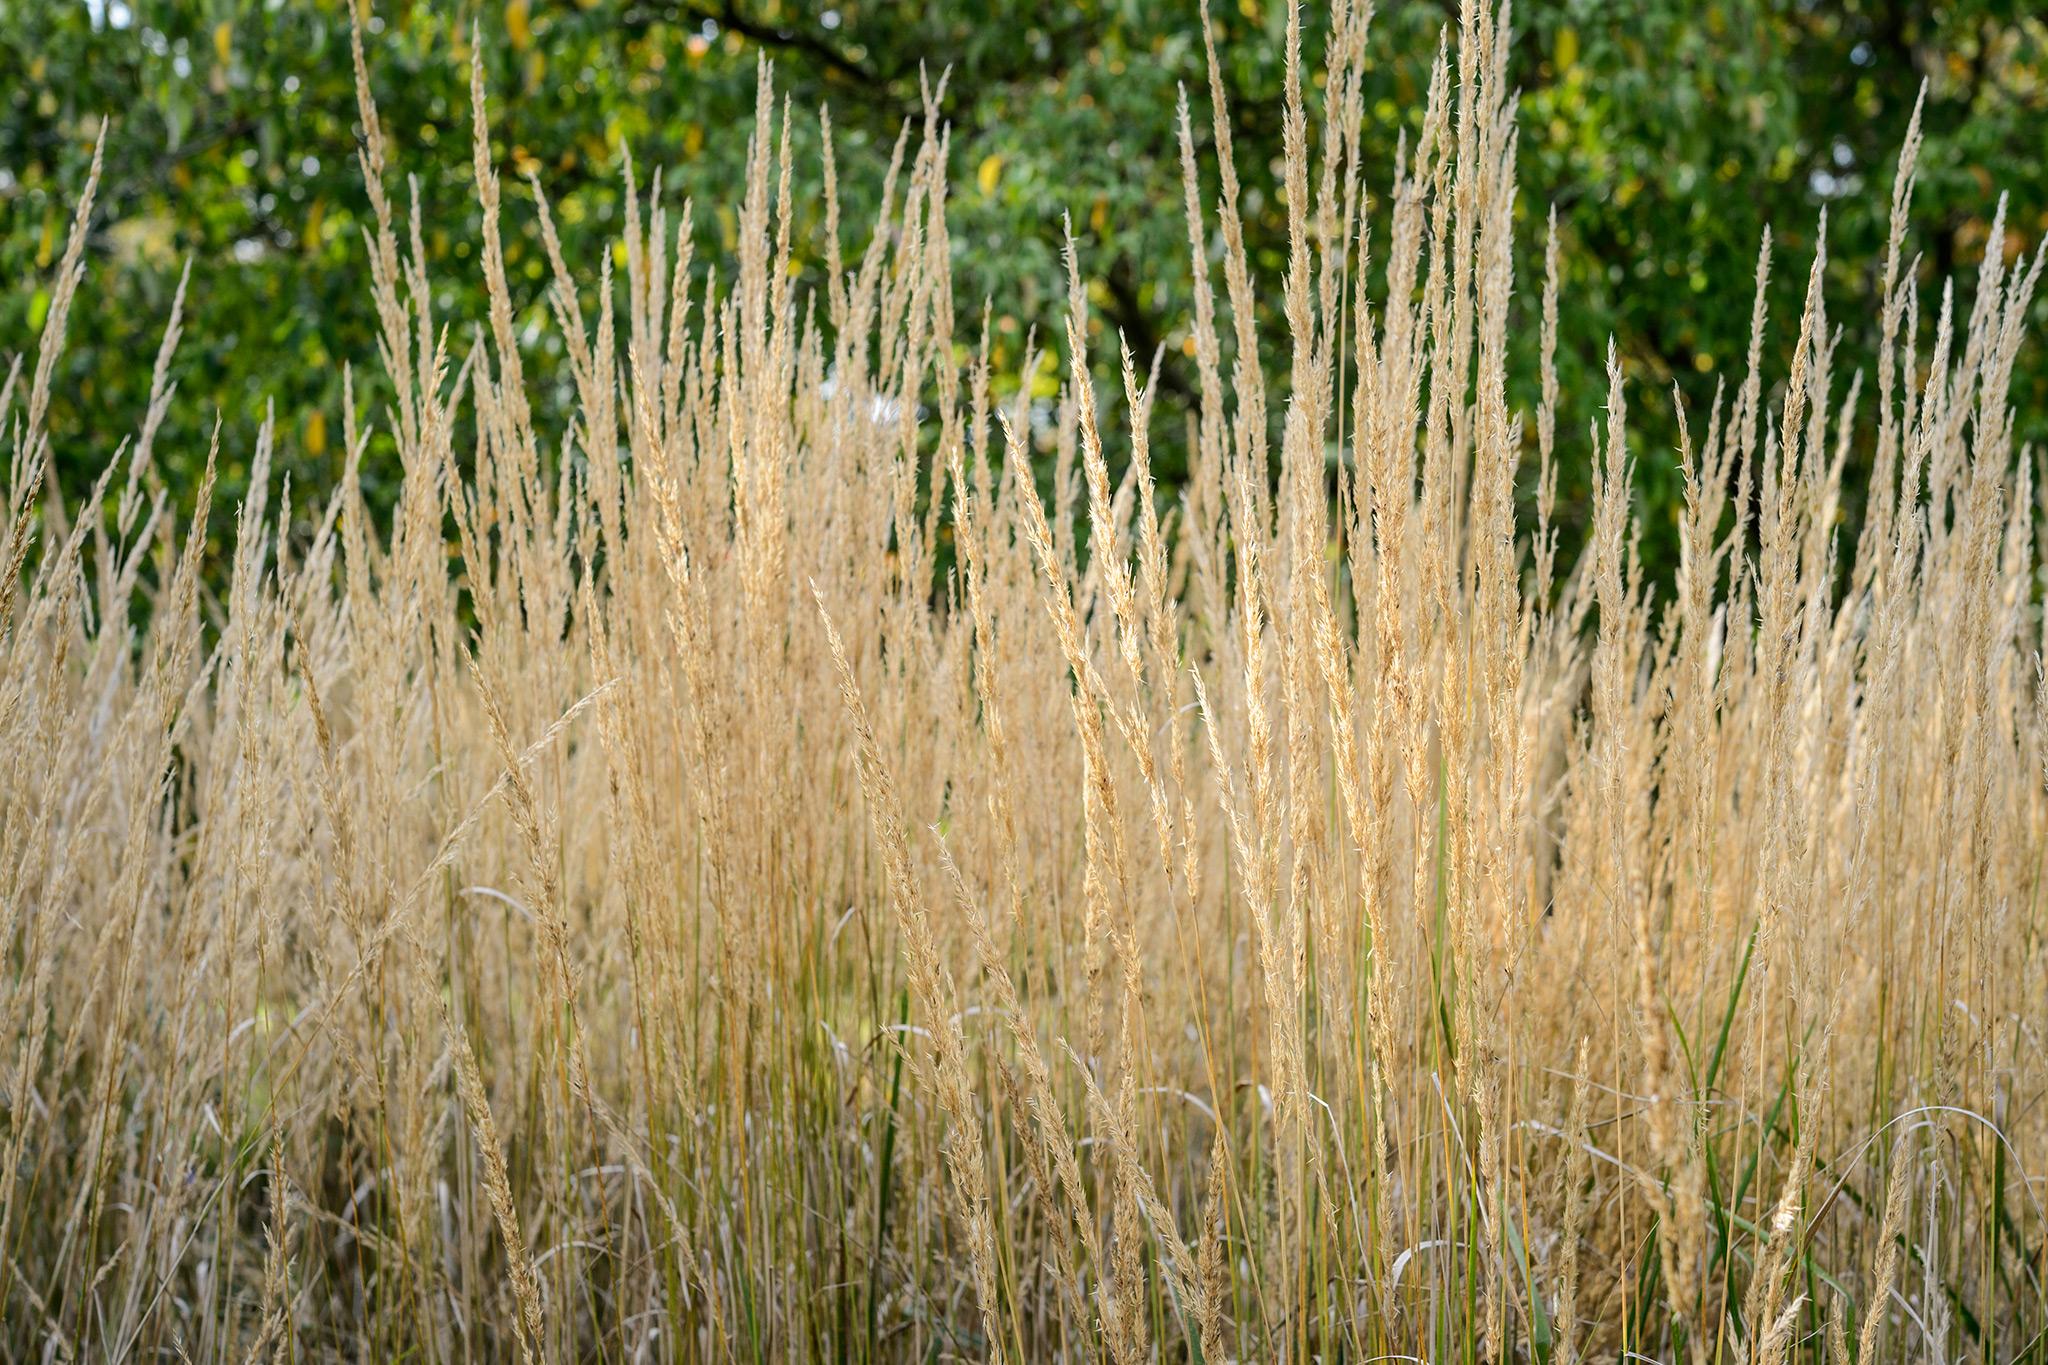 calamagrostis-x-acutiflora-karl-foerster-2